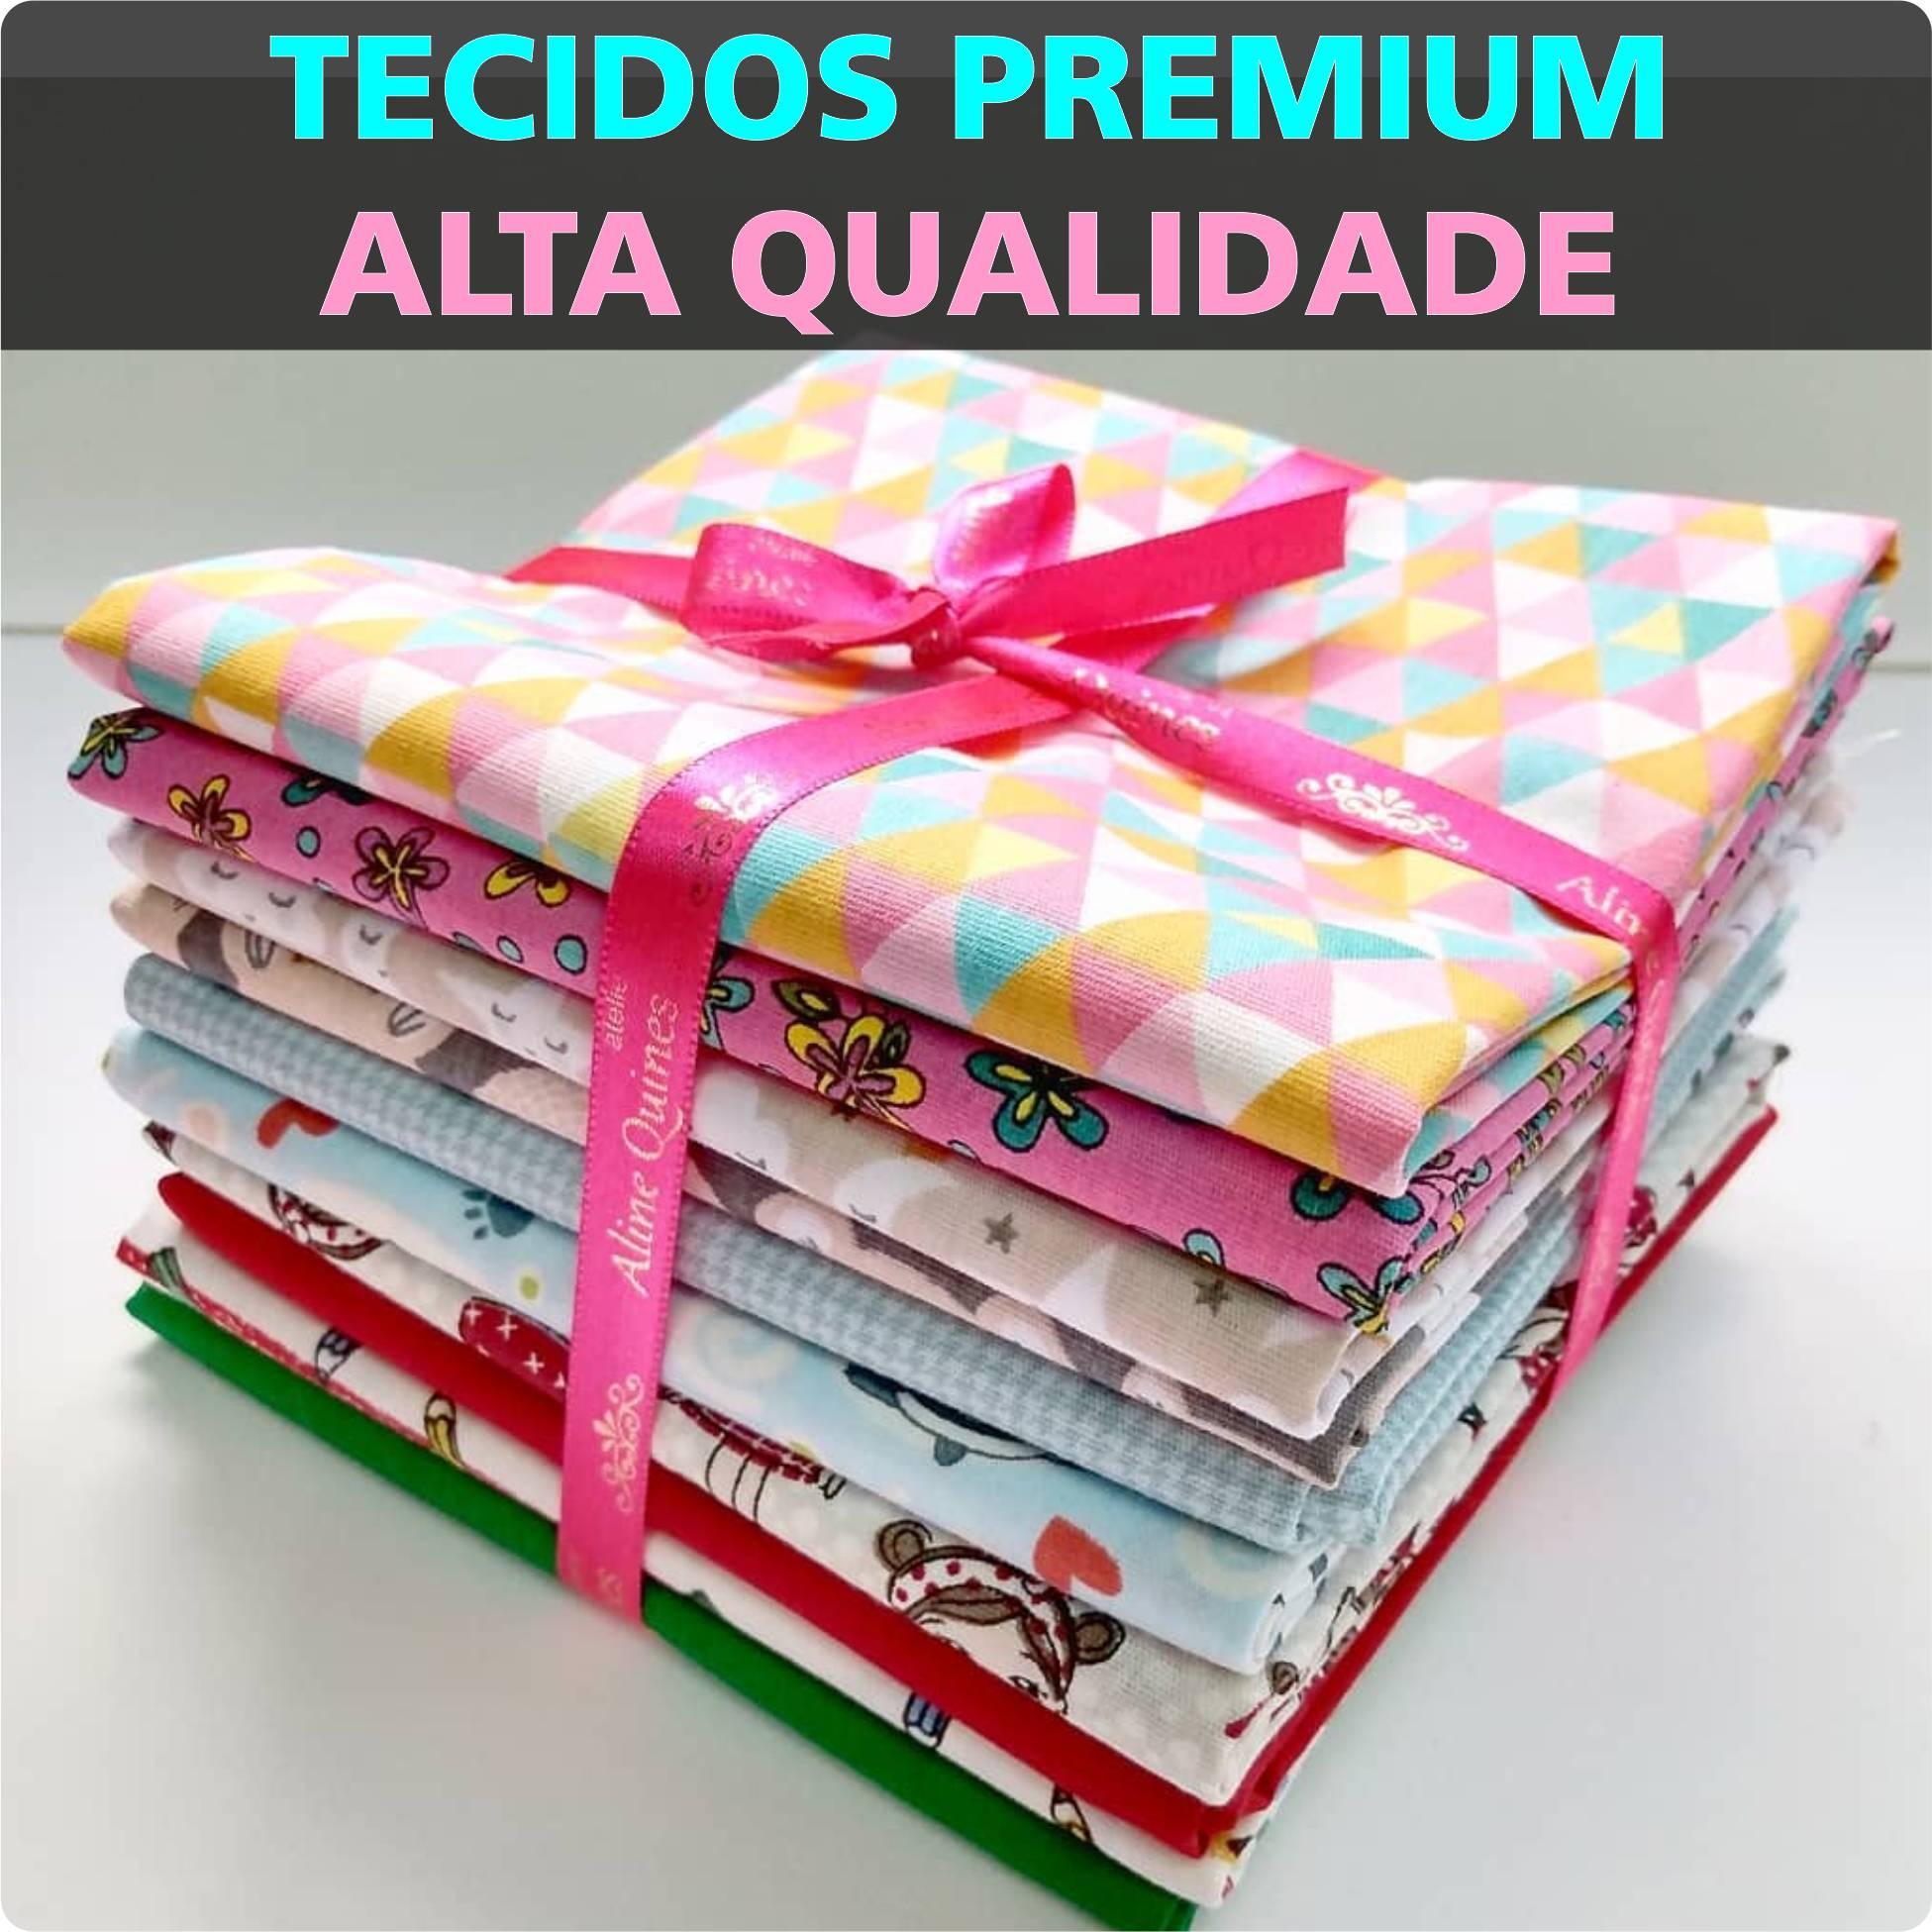 FERNANDO MALUHY - BANDANA PRETA - 25cm X 150cm - Tecido Tricoline